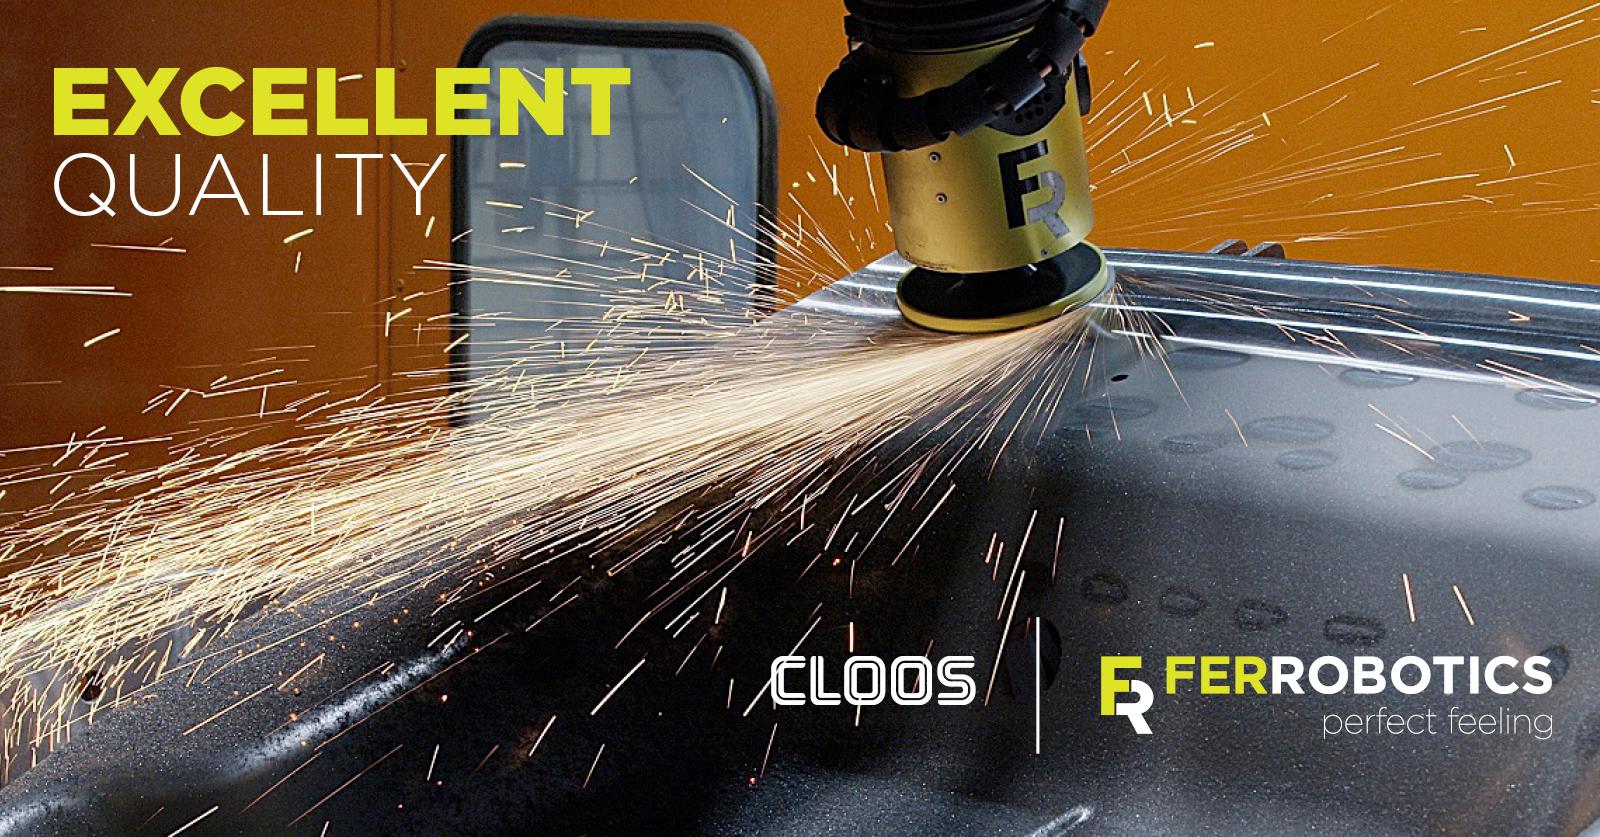 FerRobotics Cloos Kohl und Sohn Article Robotic Production